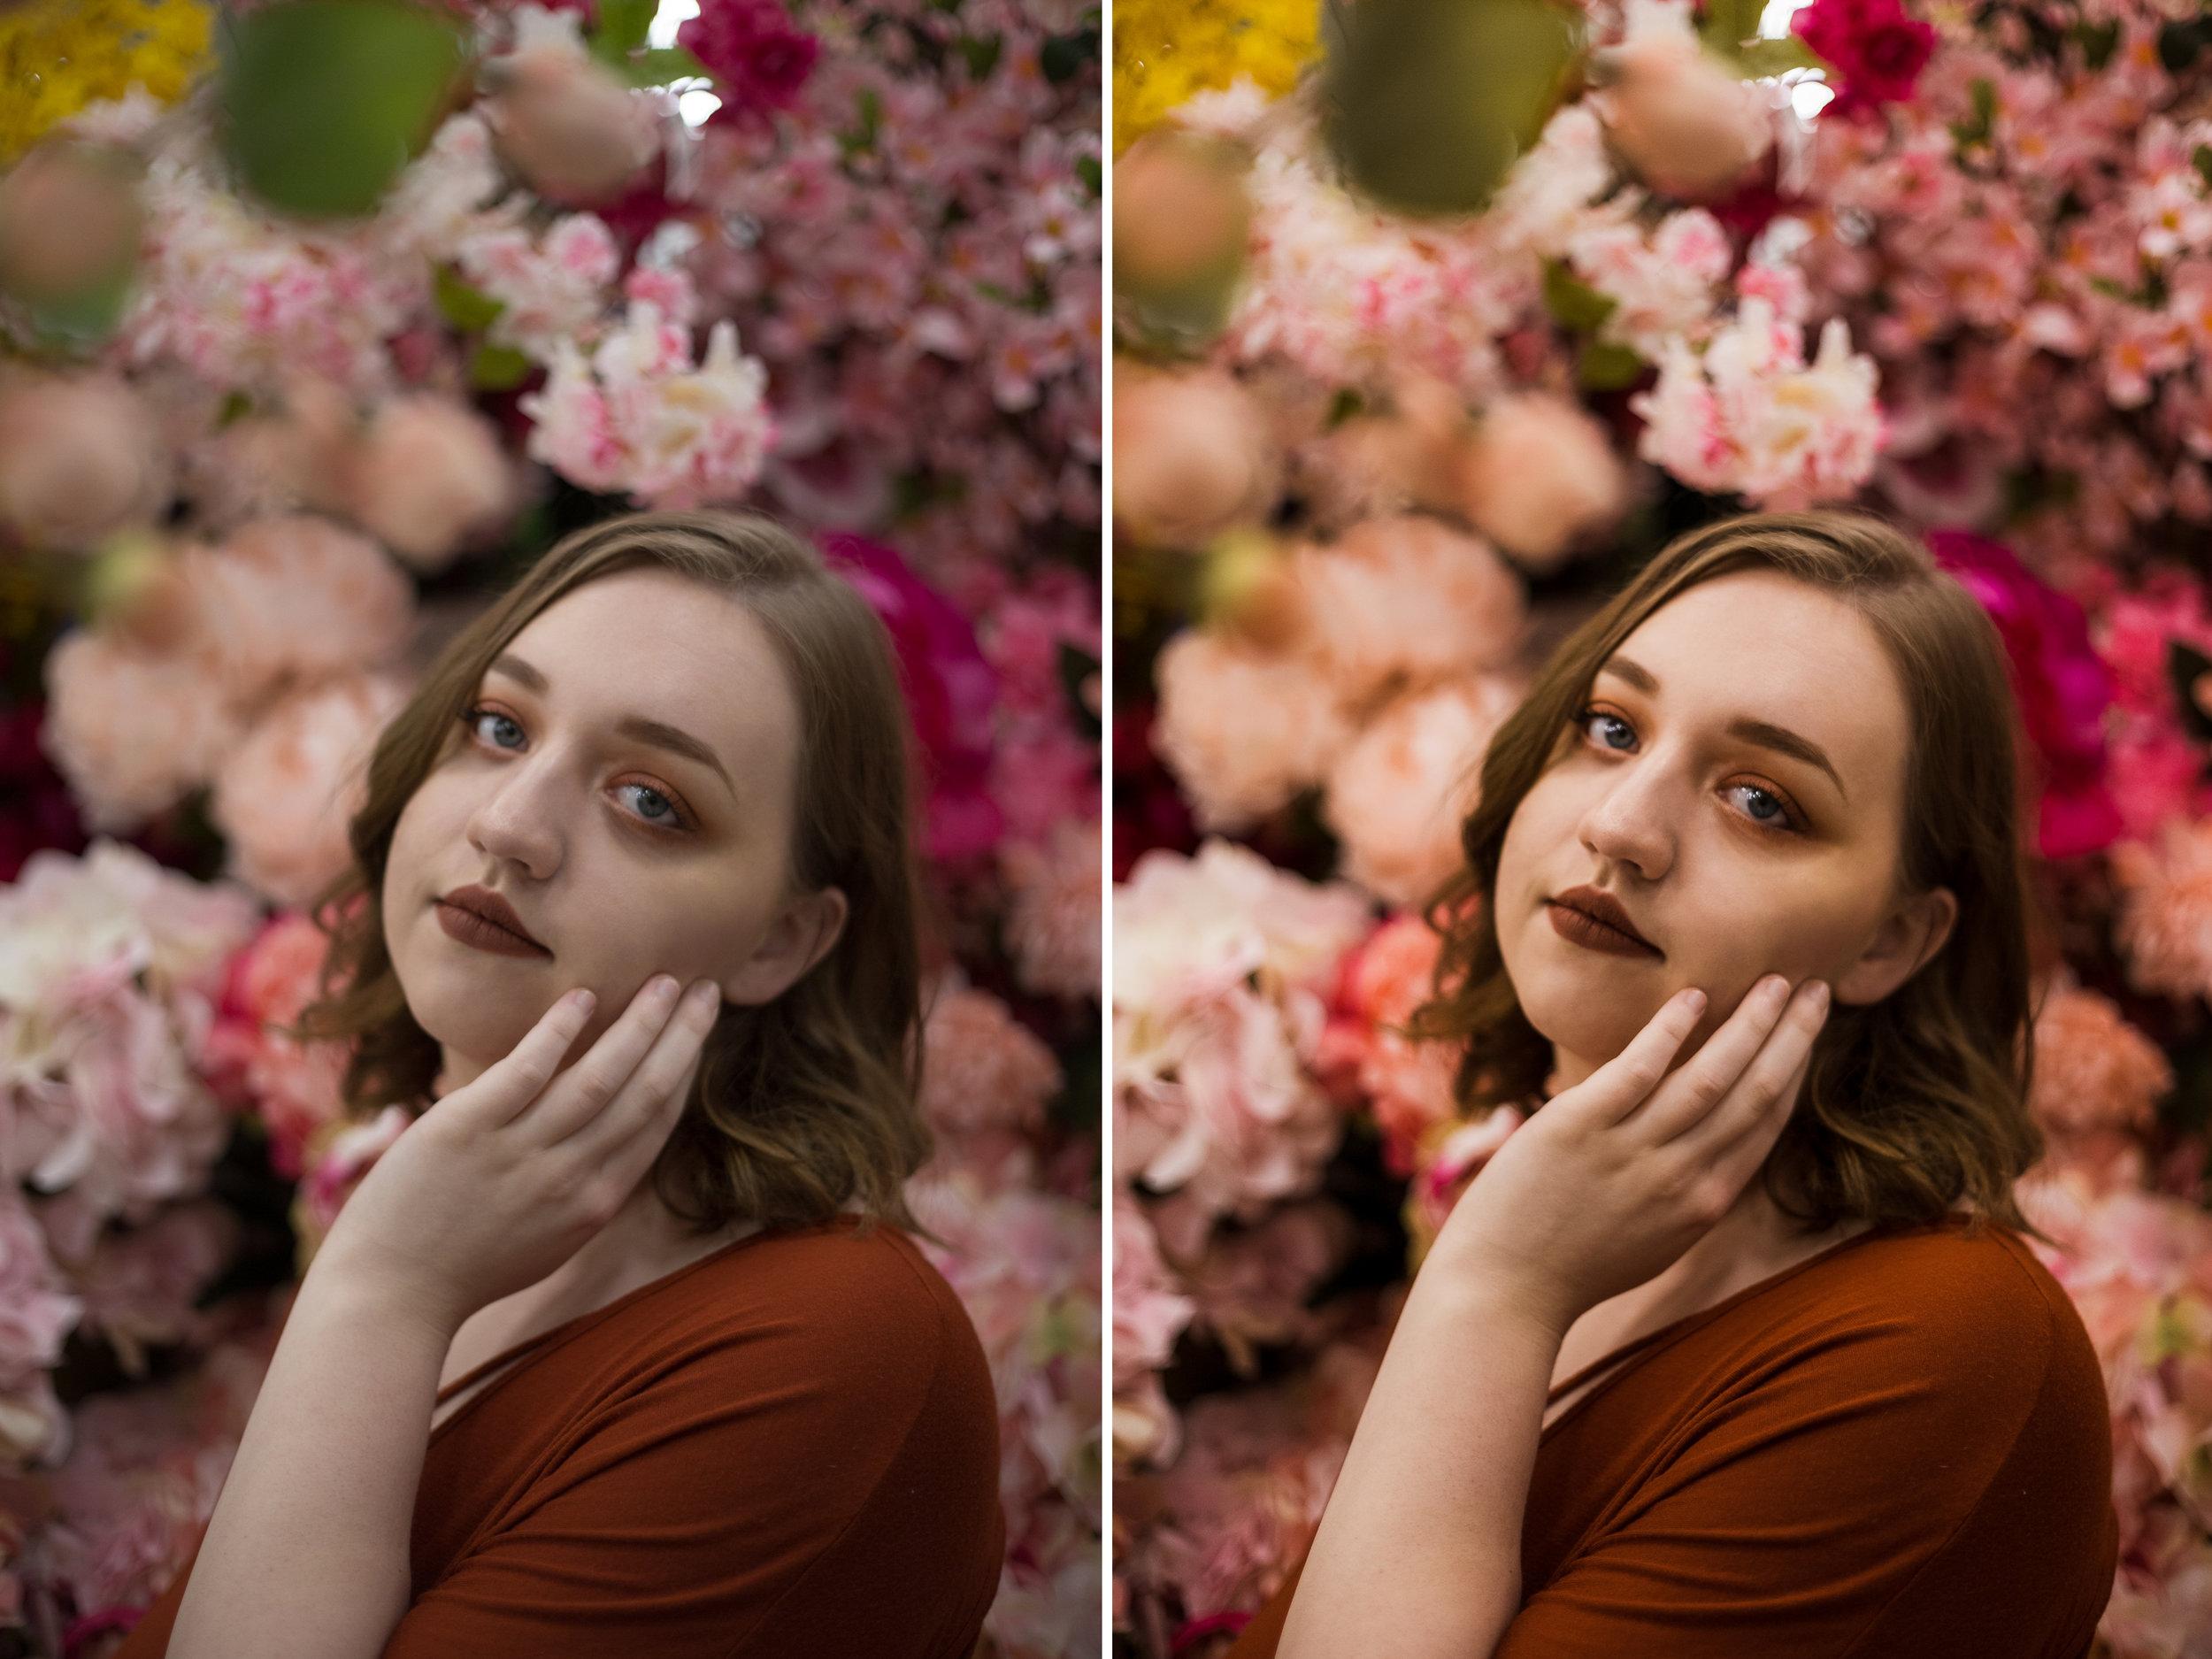 Left: Before / Right: Presets Used: Base - Base Edit 2 (tweaked), Tone/Tint - Summer Ten, Polish - Sharpen. Brushes Used: Face - Fix Under Eye Circles, Light - Brighten Highlights, Eyes- Enhance Blue Eyes2, Eyes - Enhance Catchlights